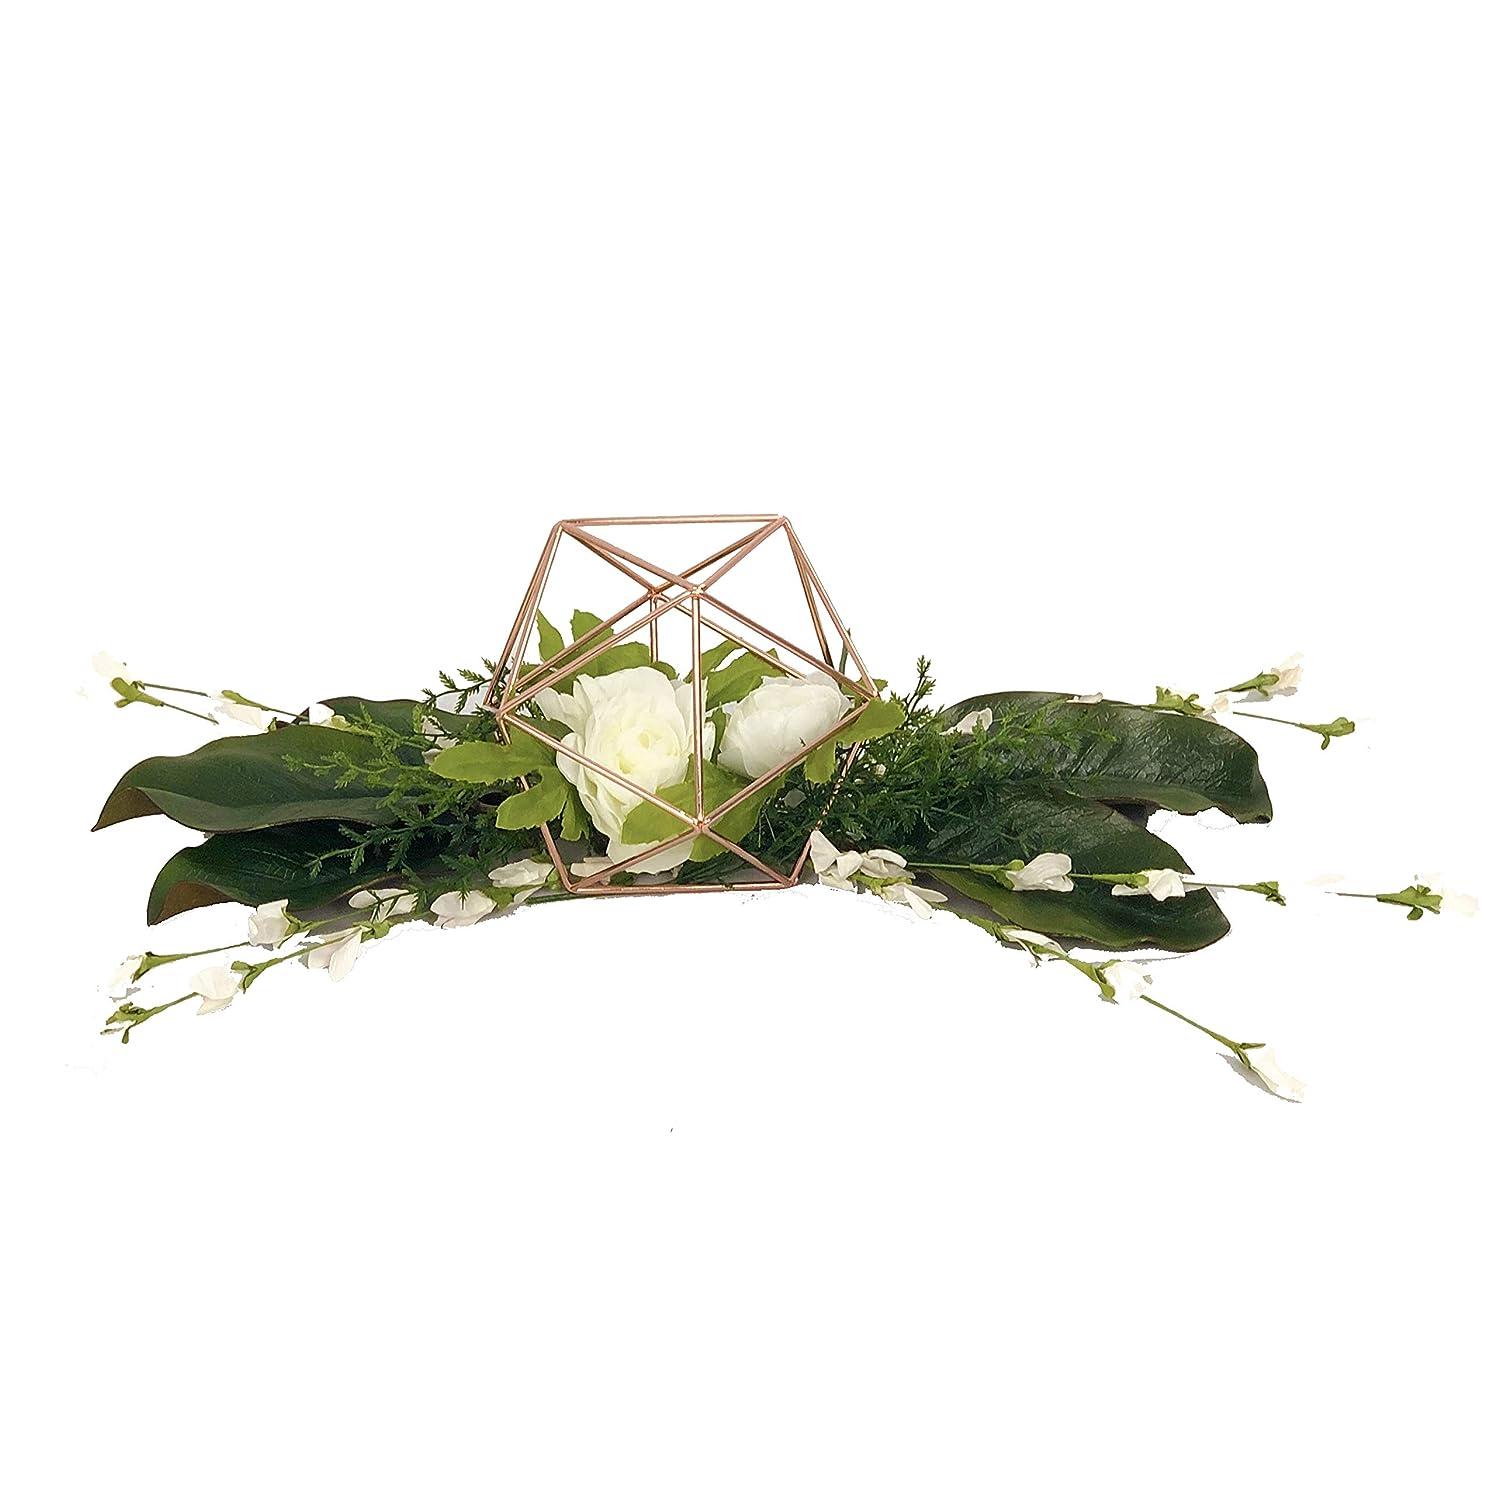 Geometric Table Centerpiece Kit with Flowers, Rose Gold Metal Geometric Centerpiece with Flowers, Centerpieces for Wedding Table, Rose Gold Geometric Decor